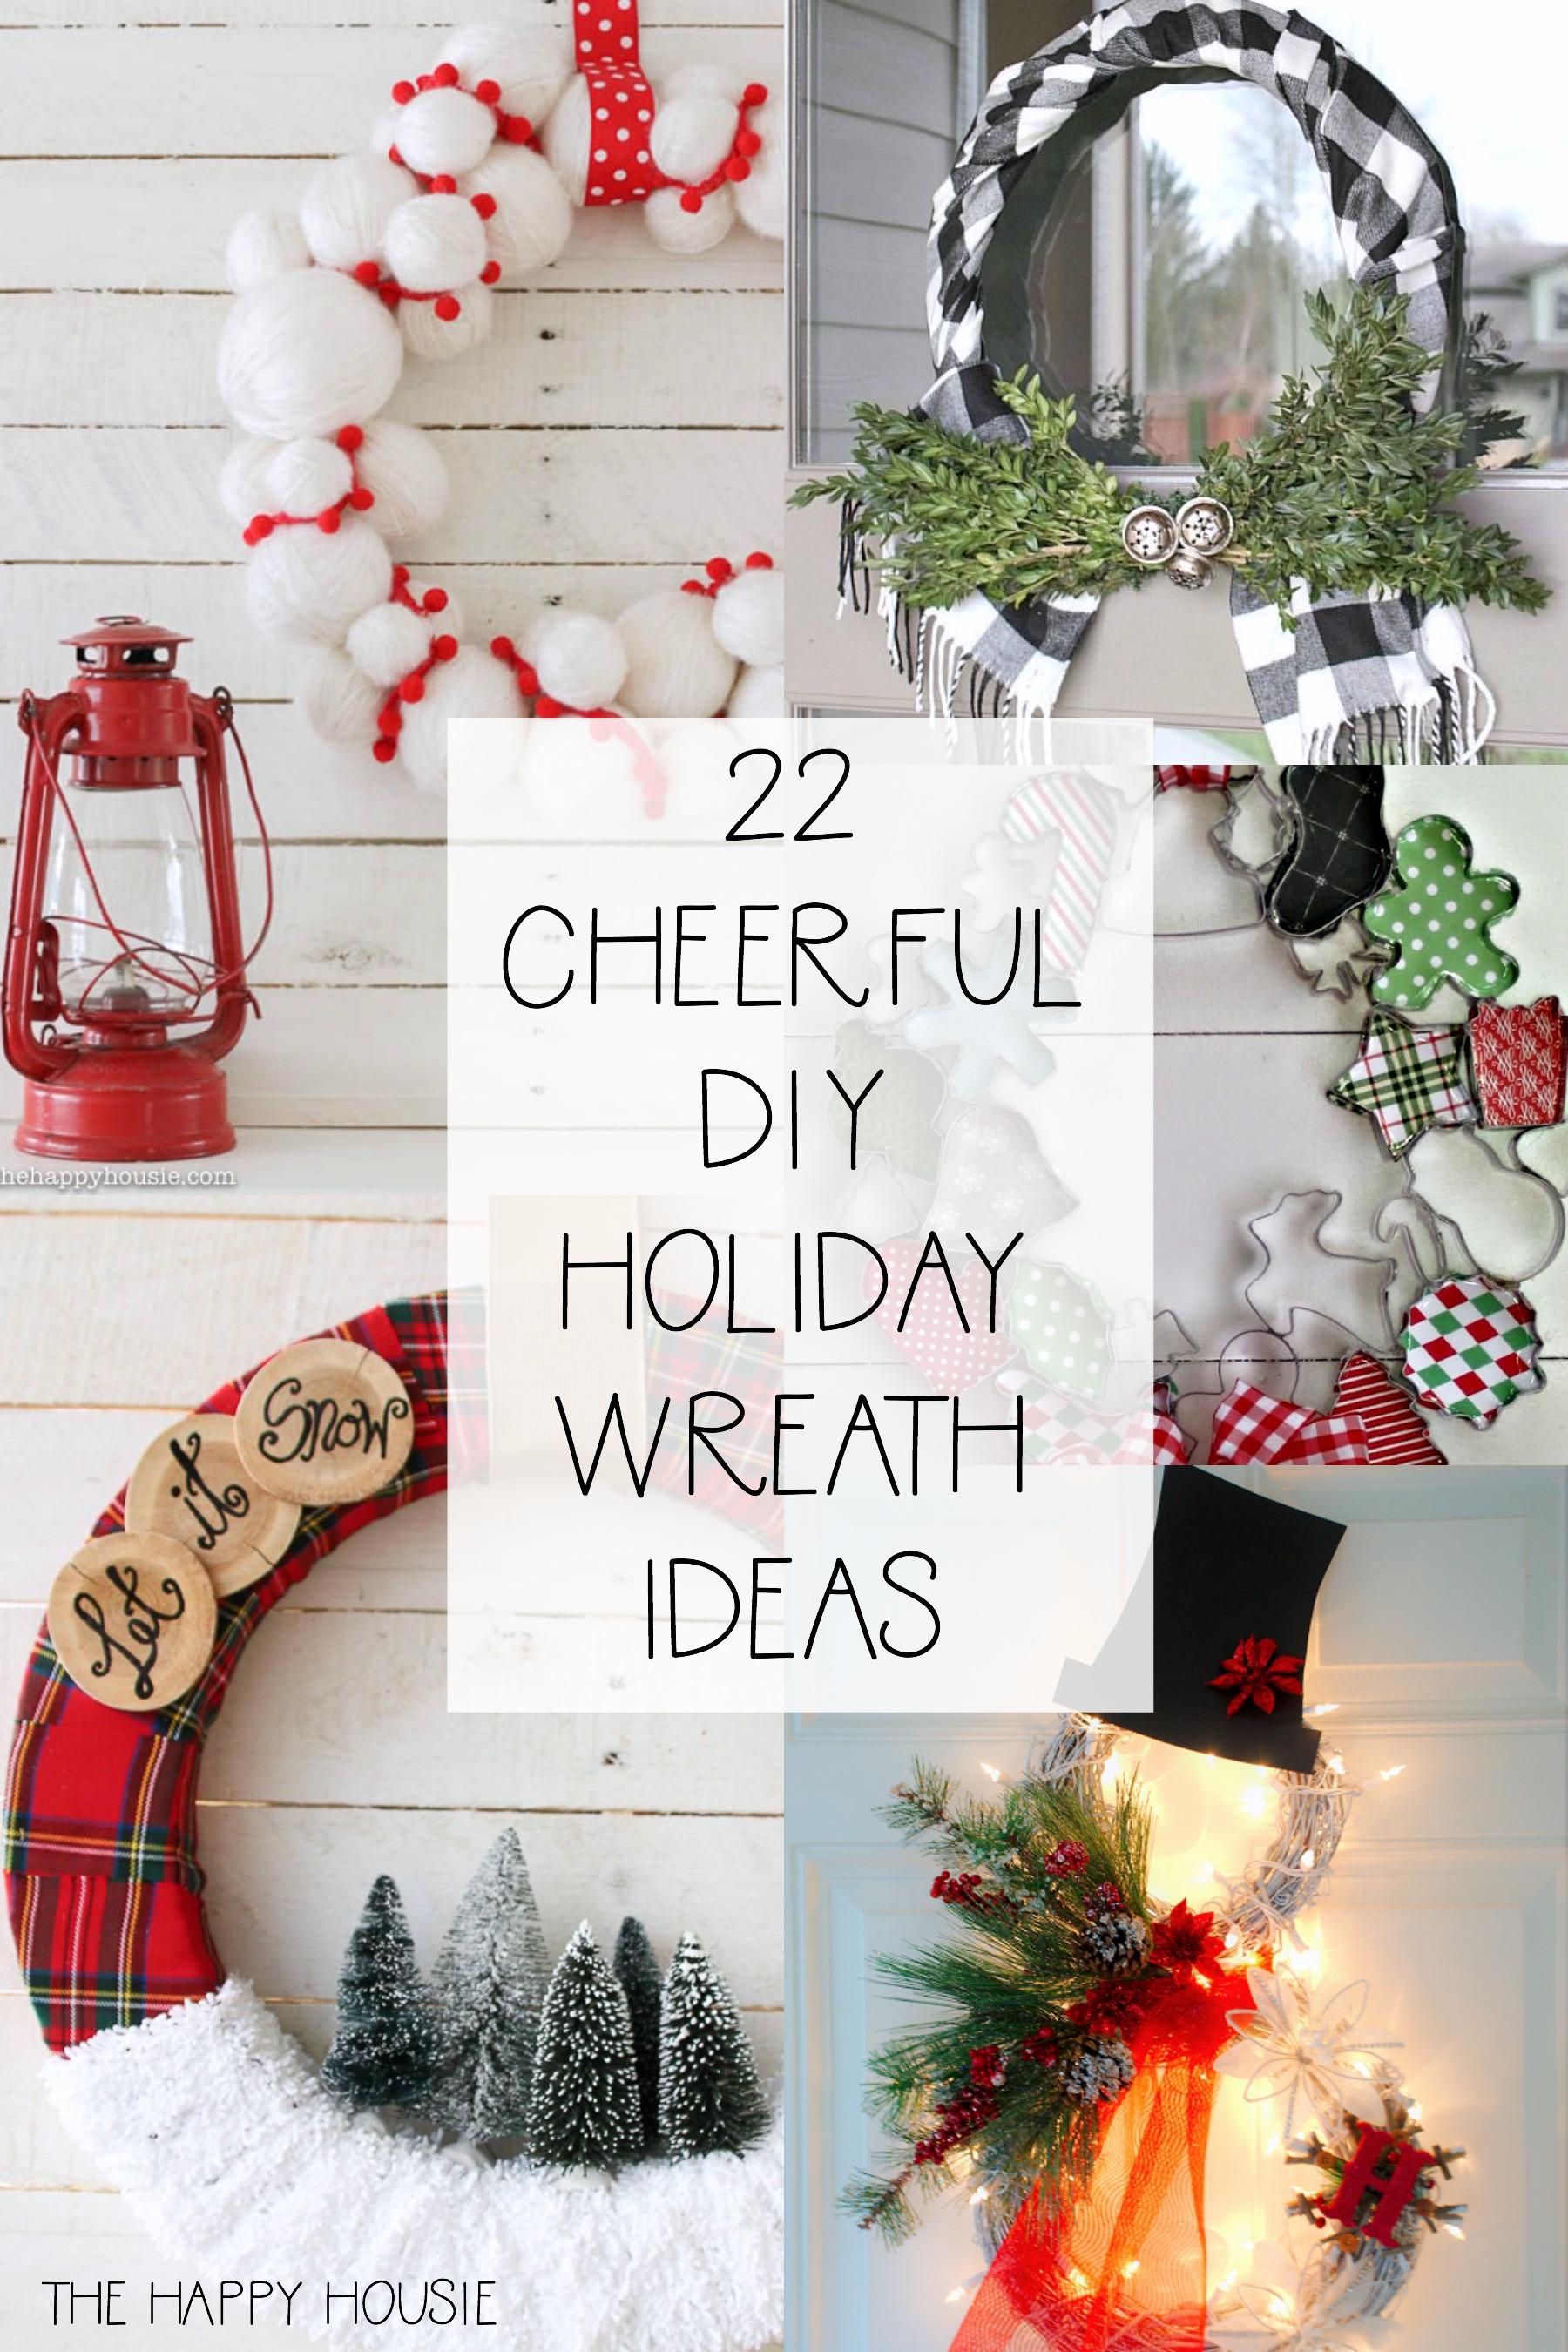 22 Cheerful DIY Holiday Wreath Ideas poster.